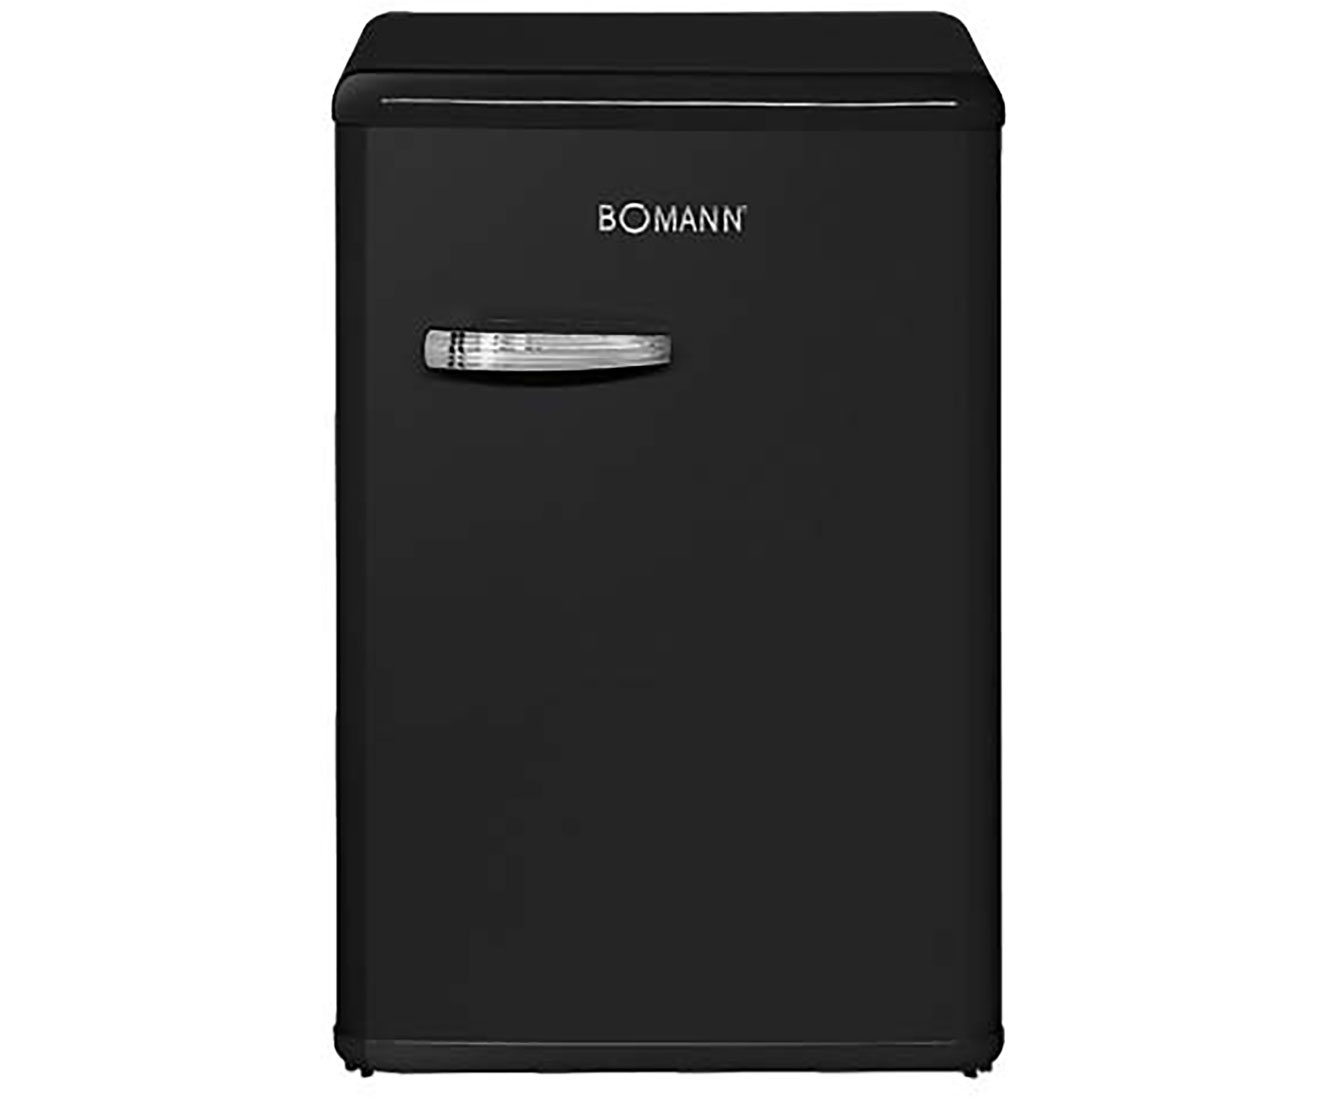 Bomann Kühlschrank Unterbaufähig : Bomann vsr 352 kühlschrank schwarz a